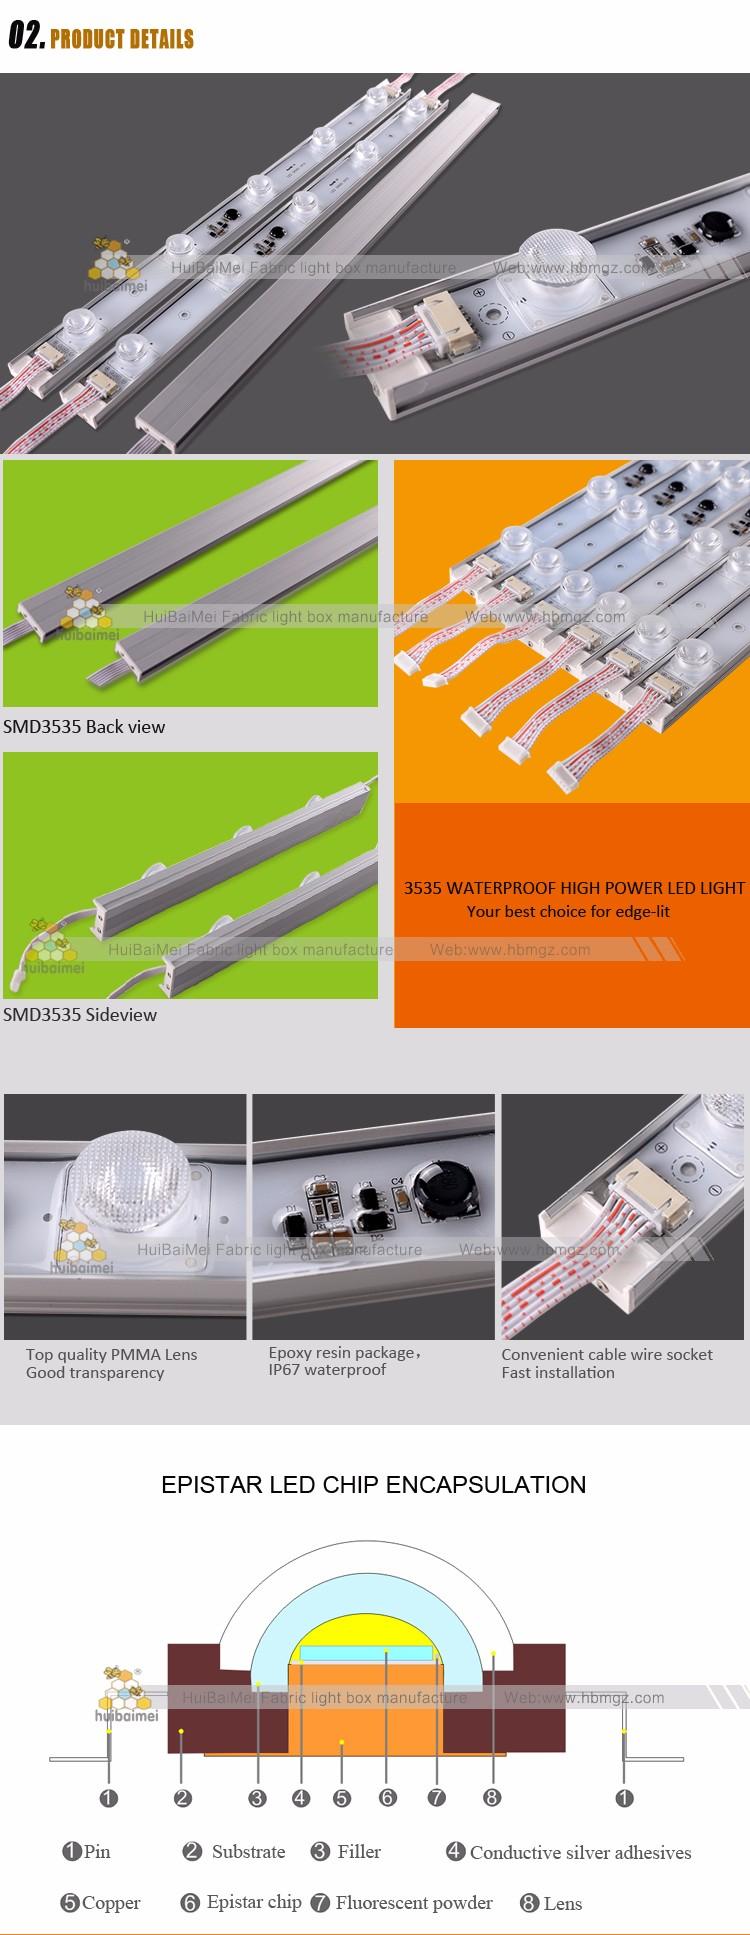 Led Edge Lighting Ce Rohs Certified Rigid Bar Lit High Power Wiring Diagram 3535